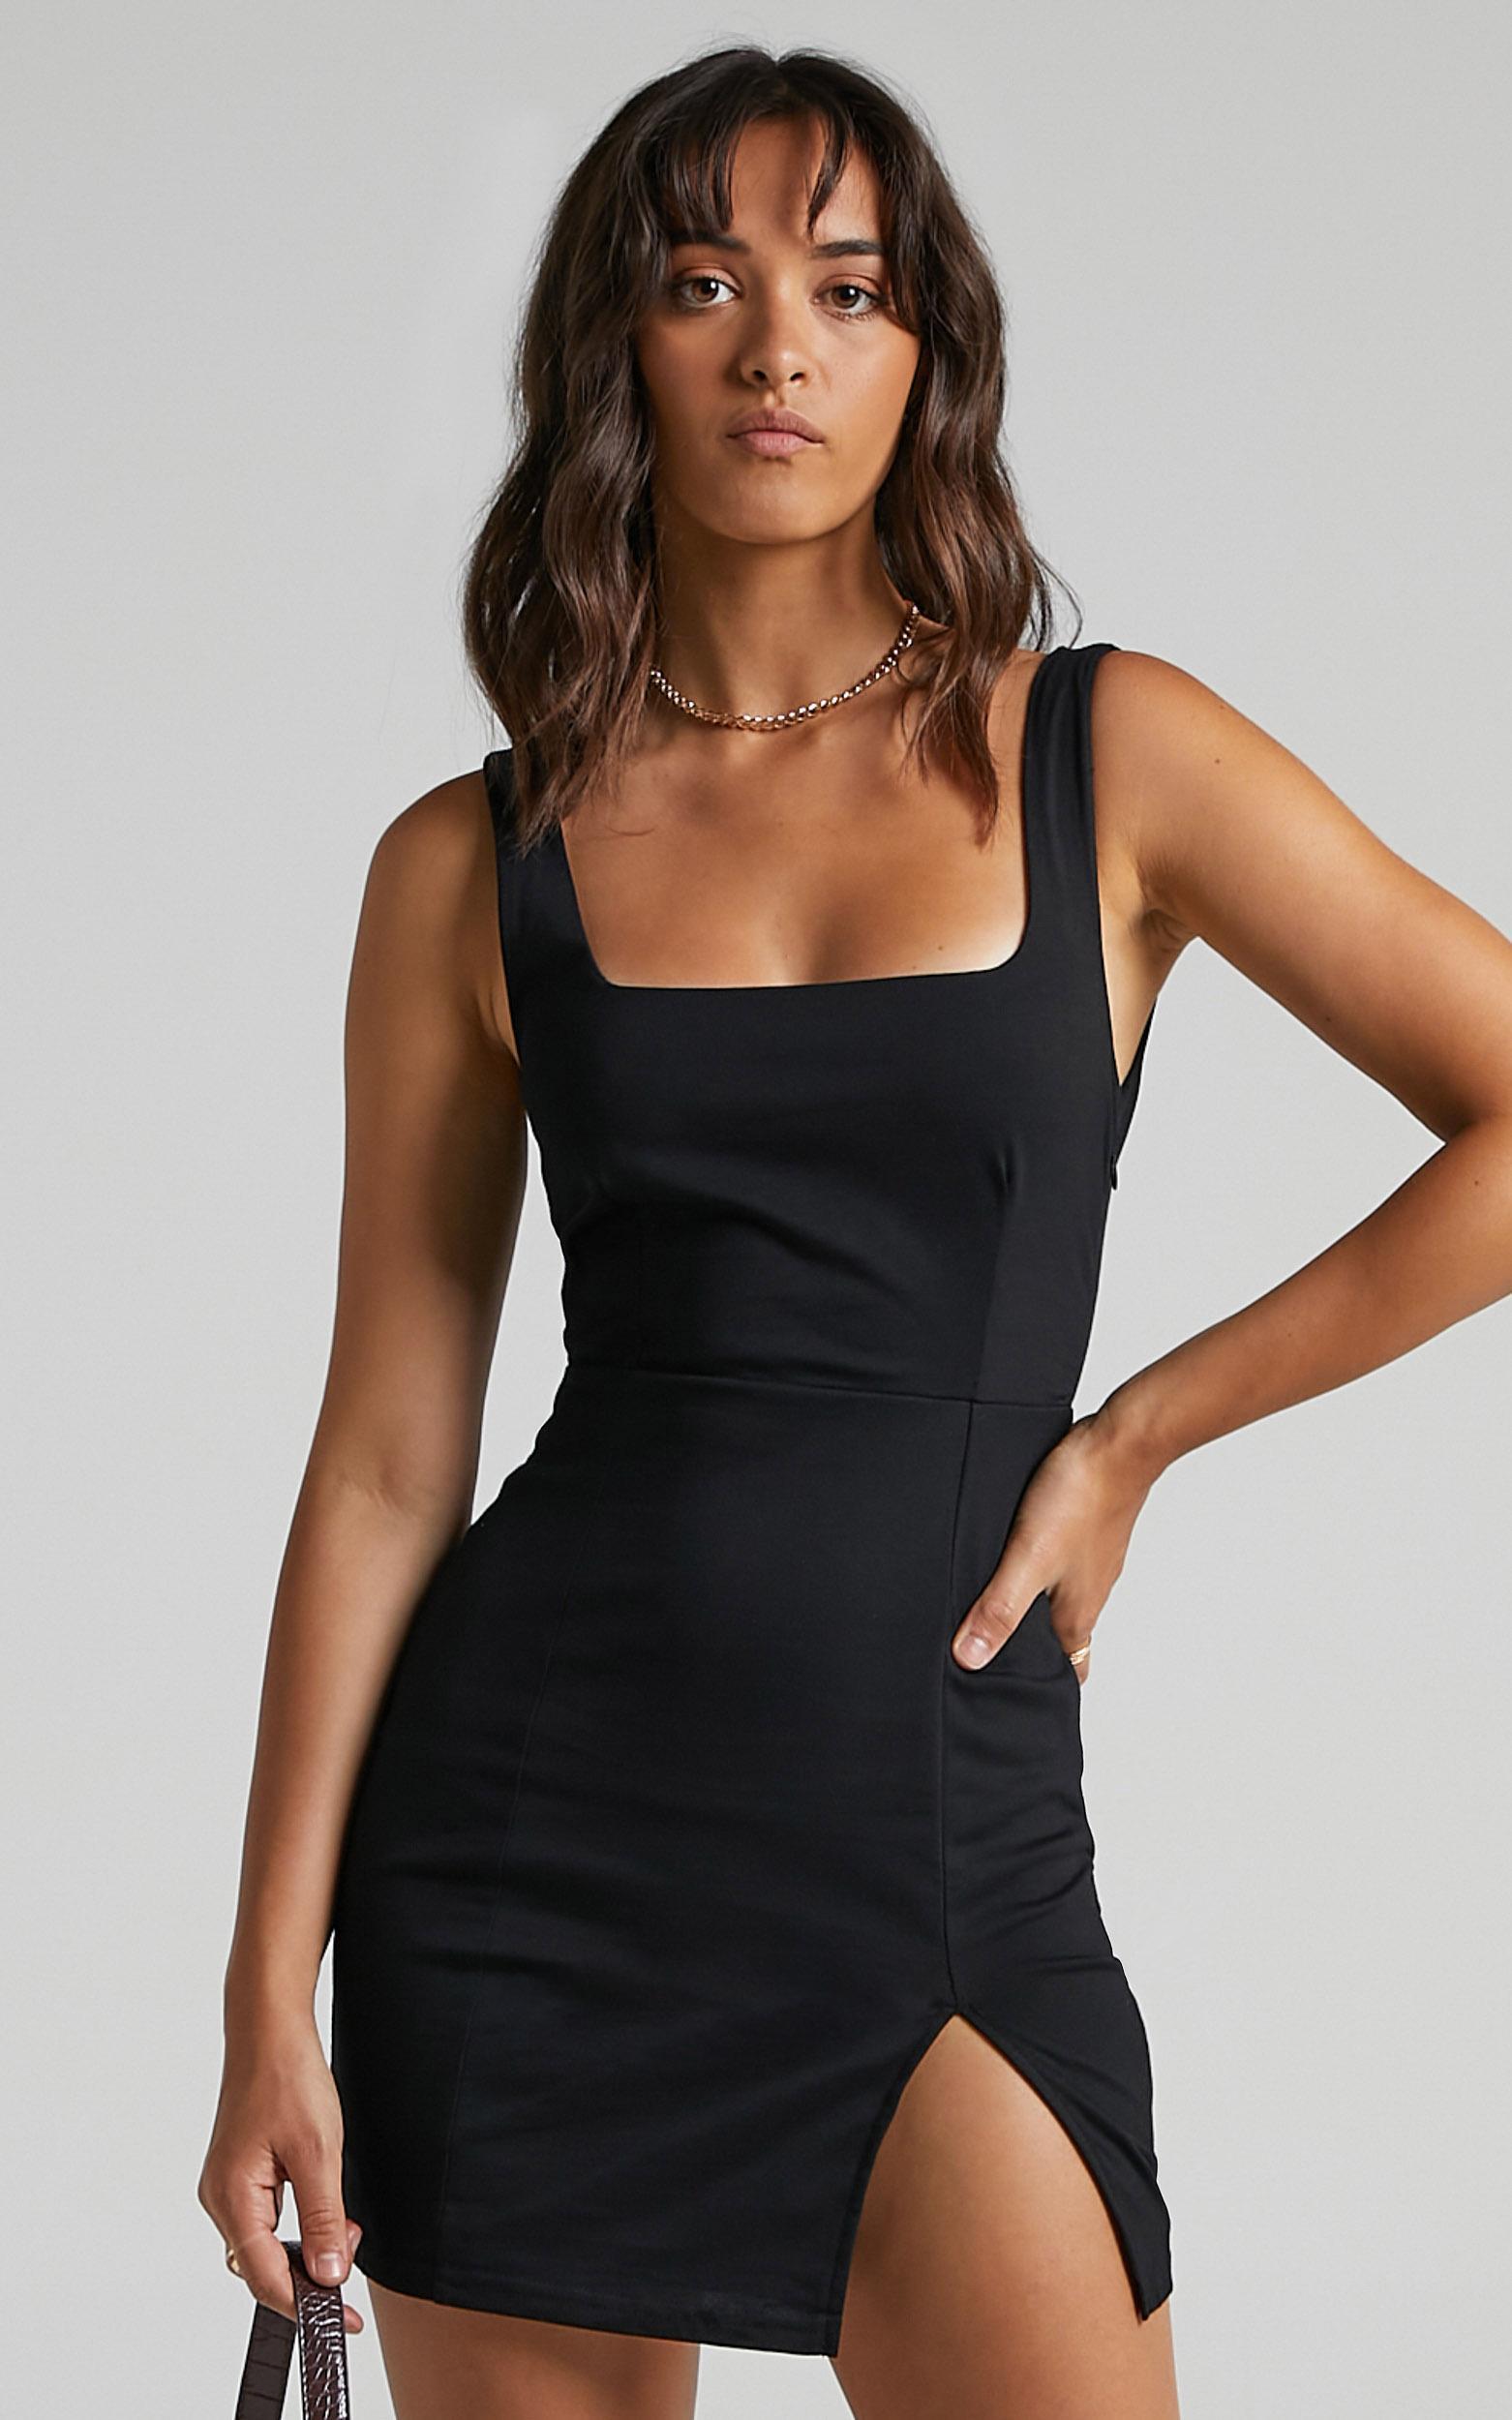 Hughes Dress in Black - 6 (XS), Black, hi-res image number null